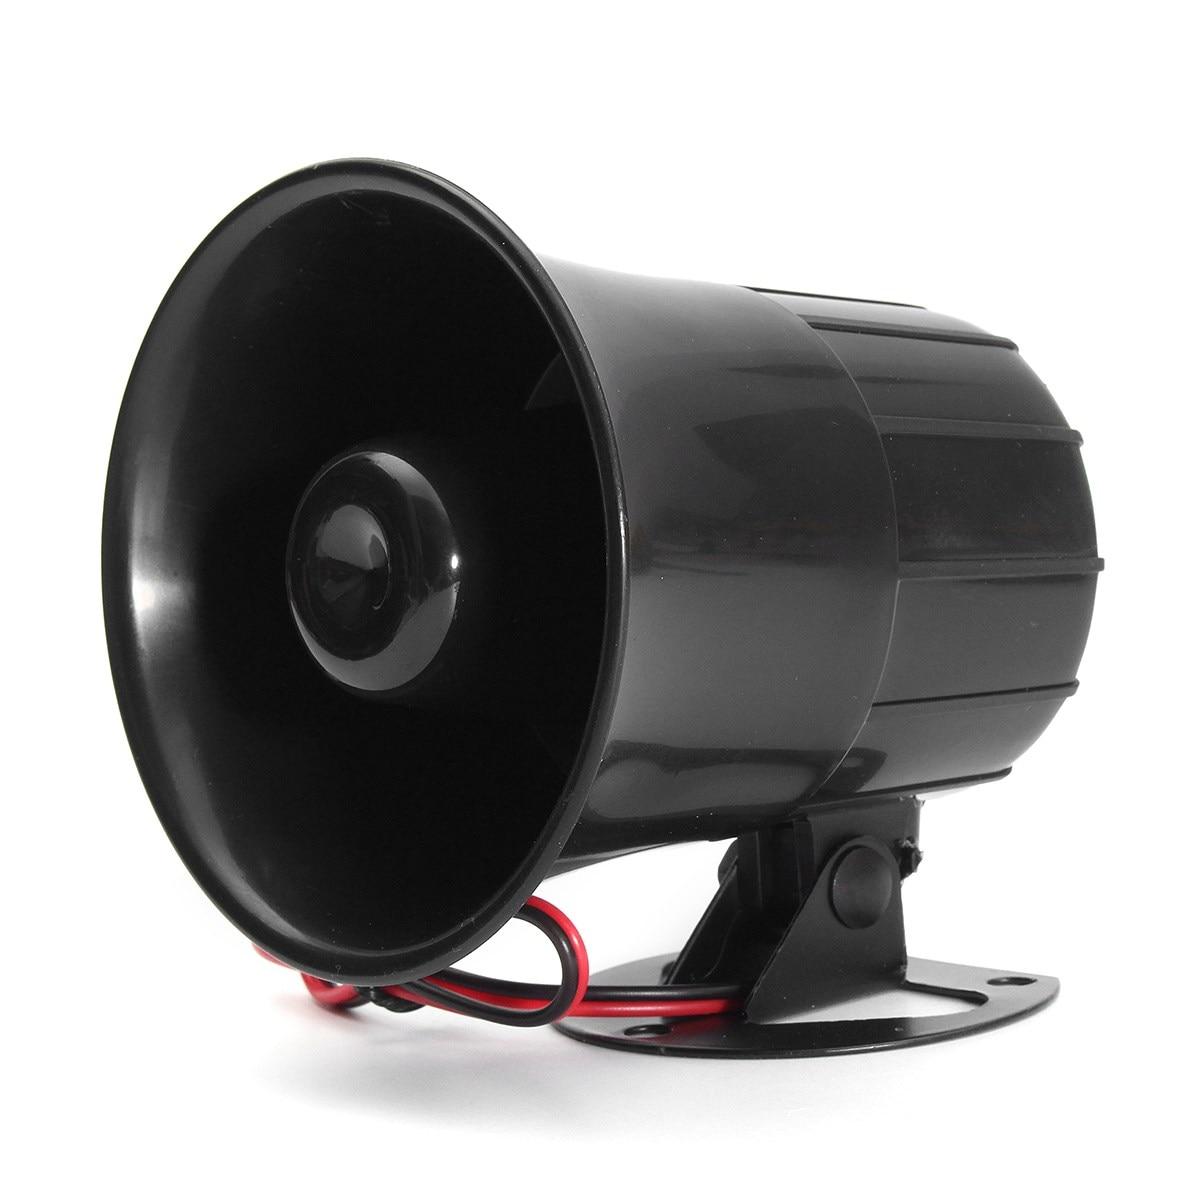 12V 15W Electric Car Truck Alarm Siren Horn Loud Speaker Auto Sound Universal Wehicle Car Motor Motorcycles Speaker Horns